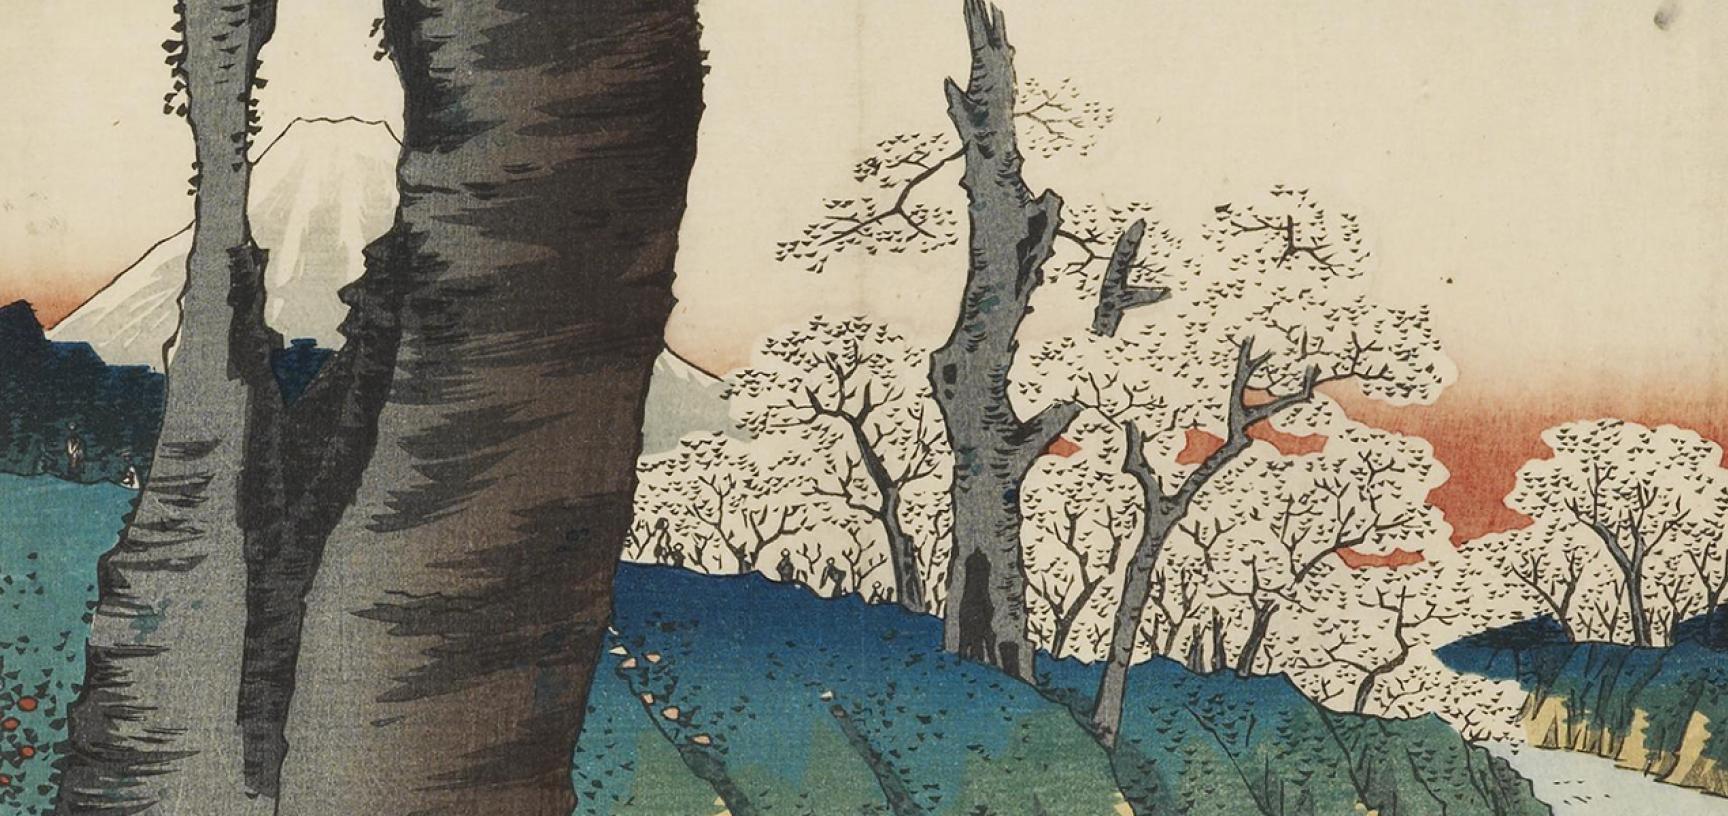 Koganei in Musashi Province by Utagawa Hiroshige (detail)